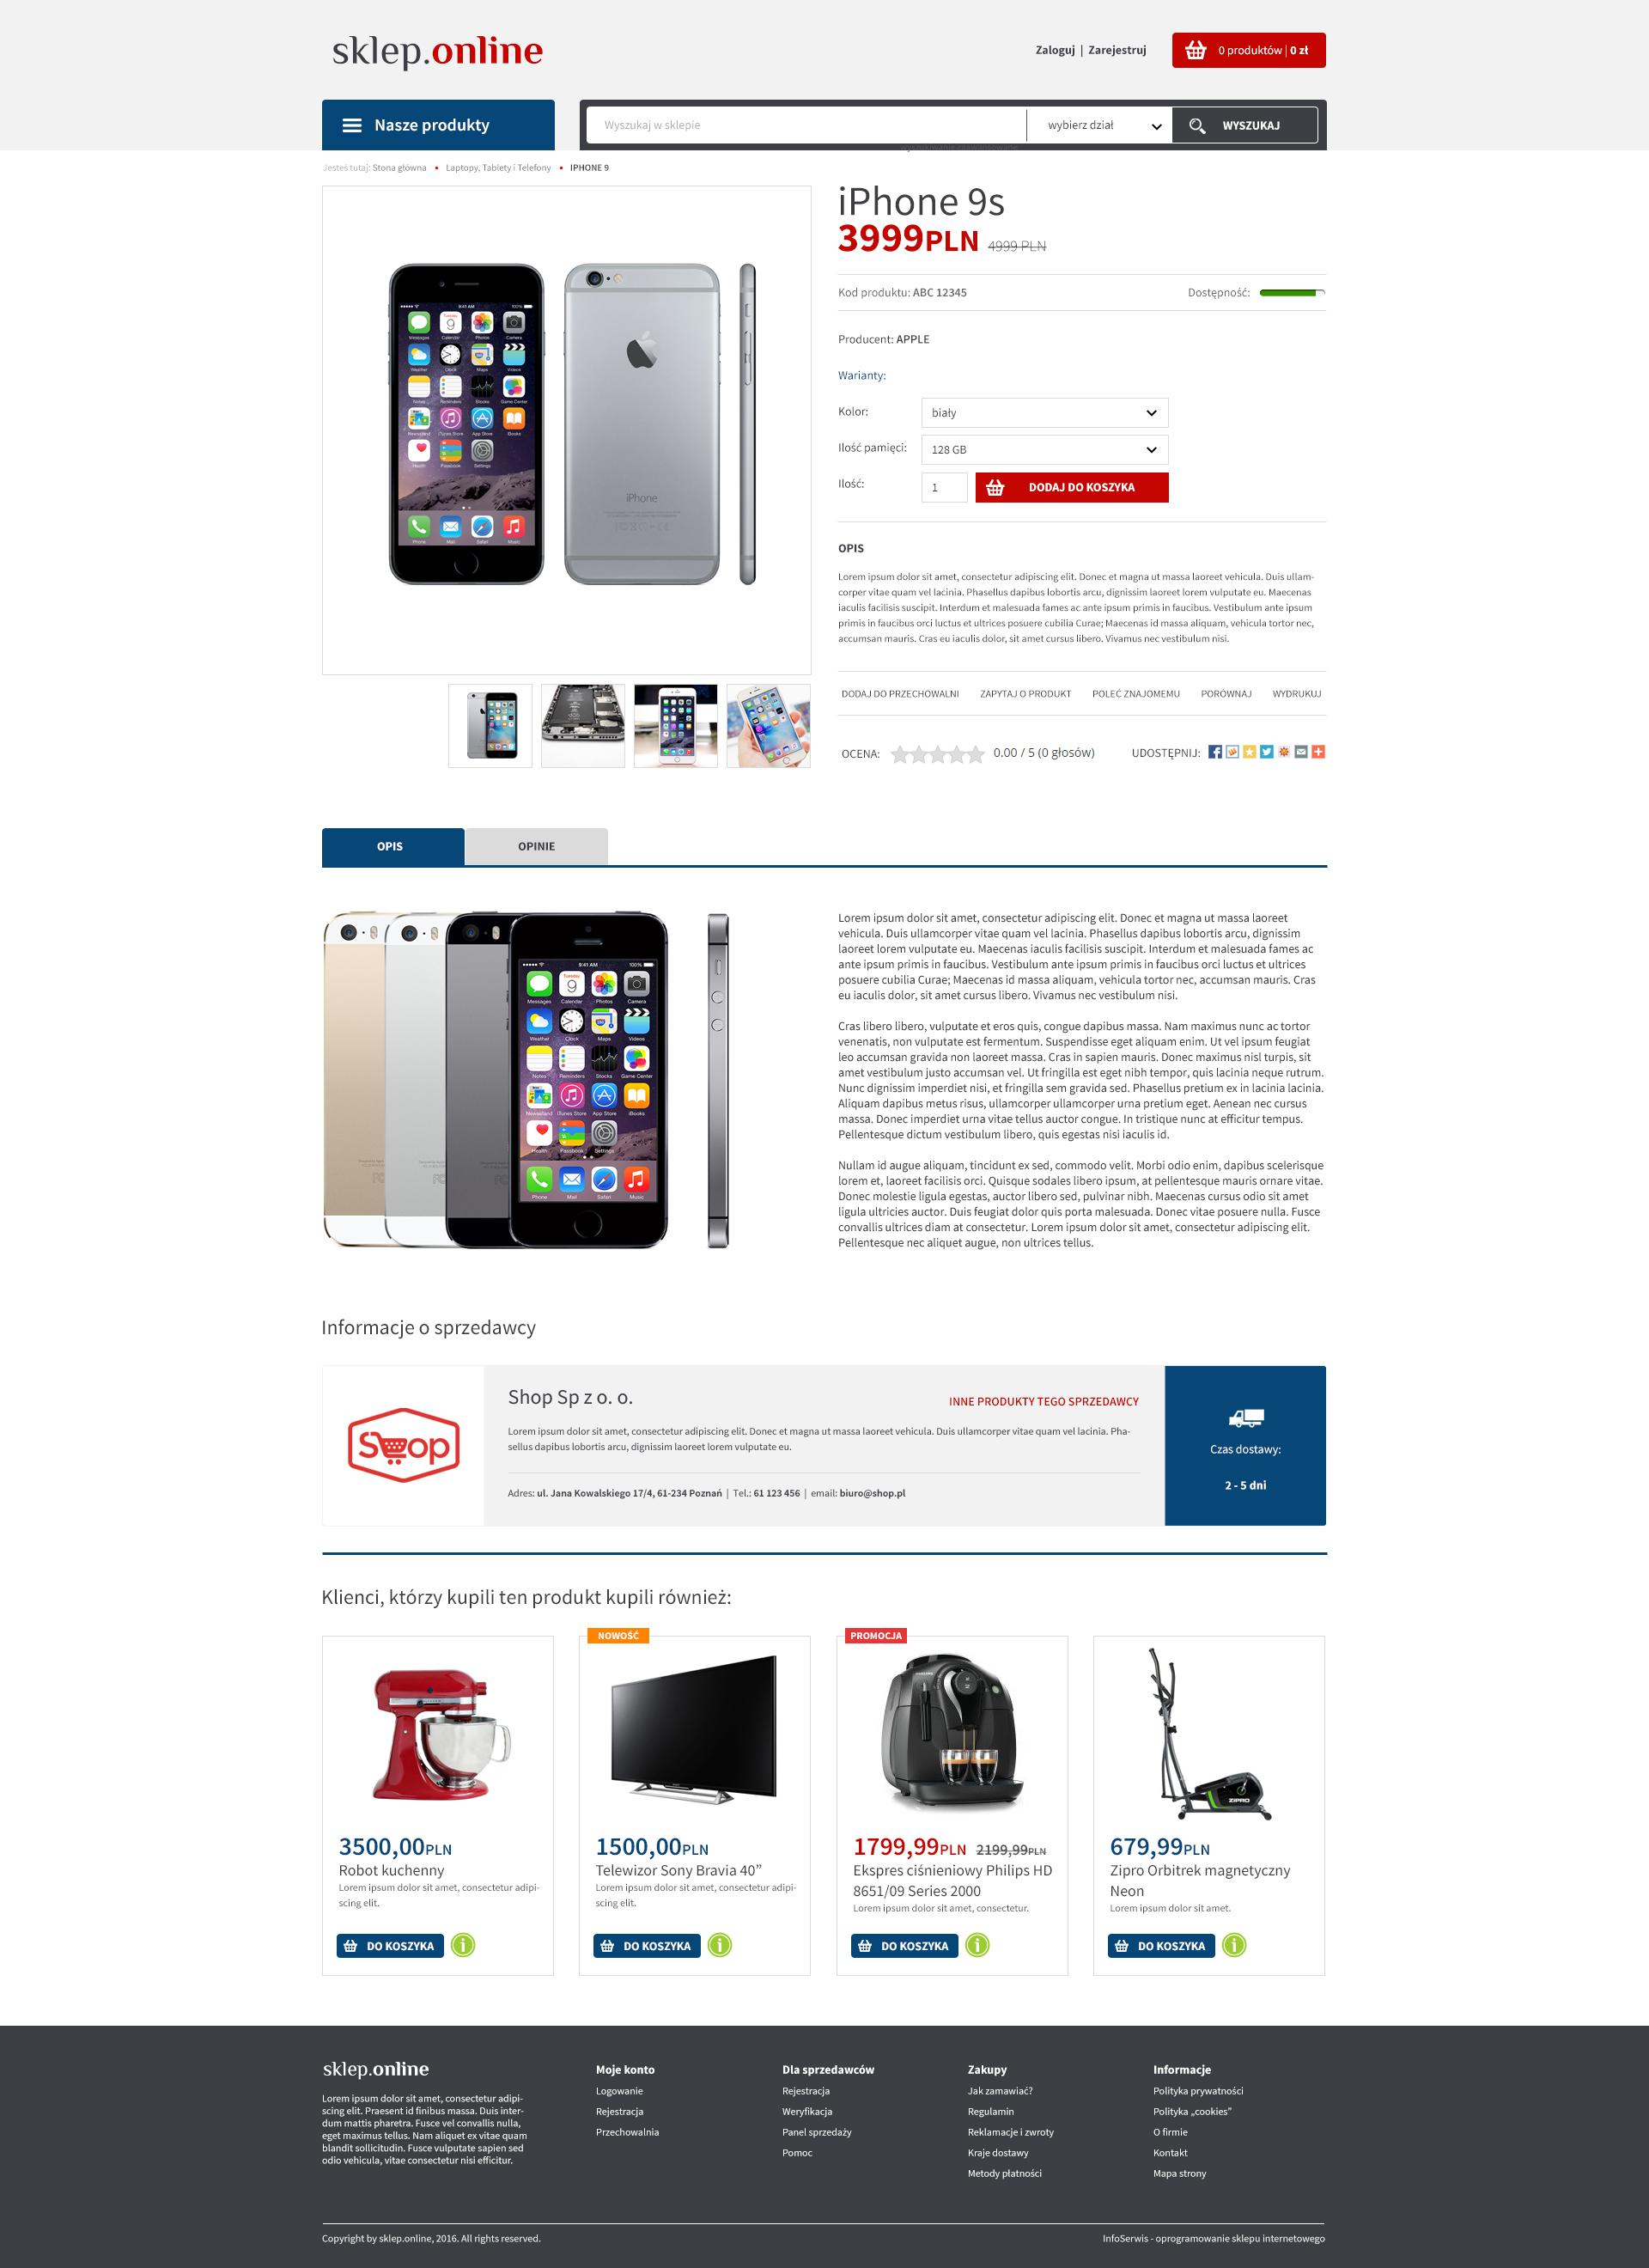 BSI Shop - Browse thousands of British Standards. Buy PDF download or hard copy.